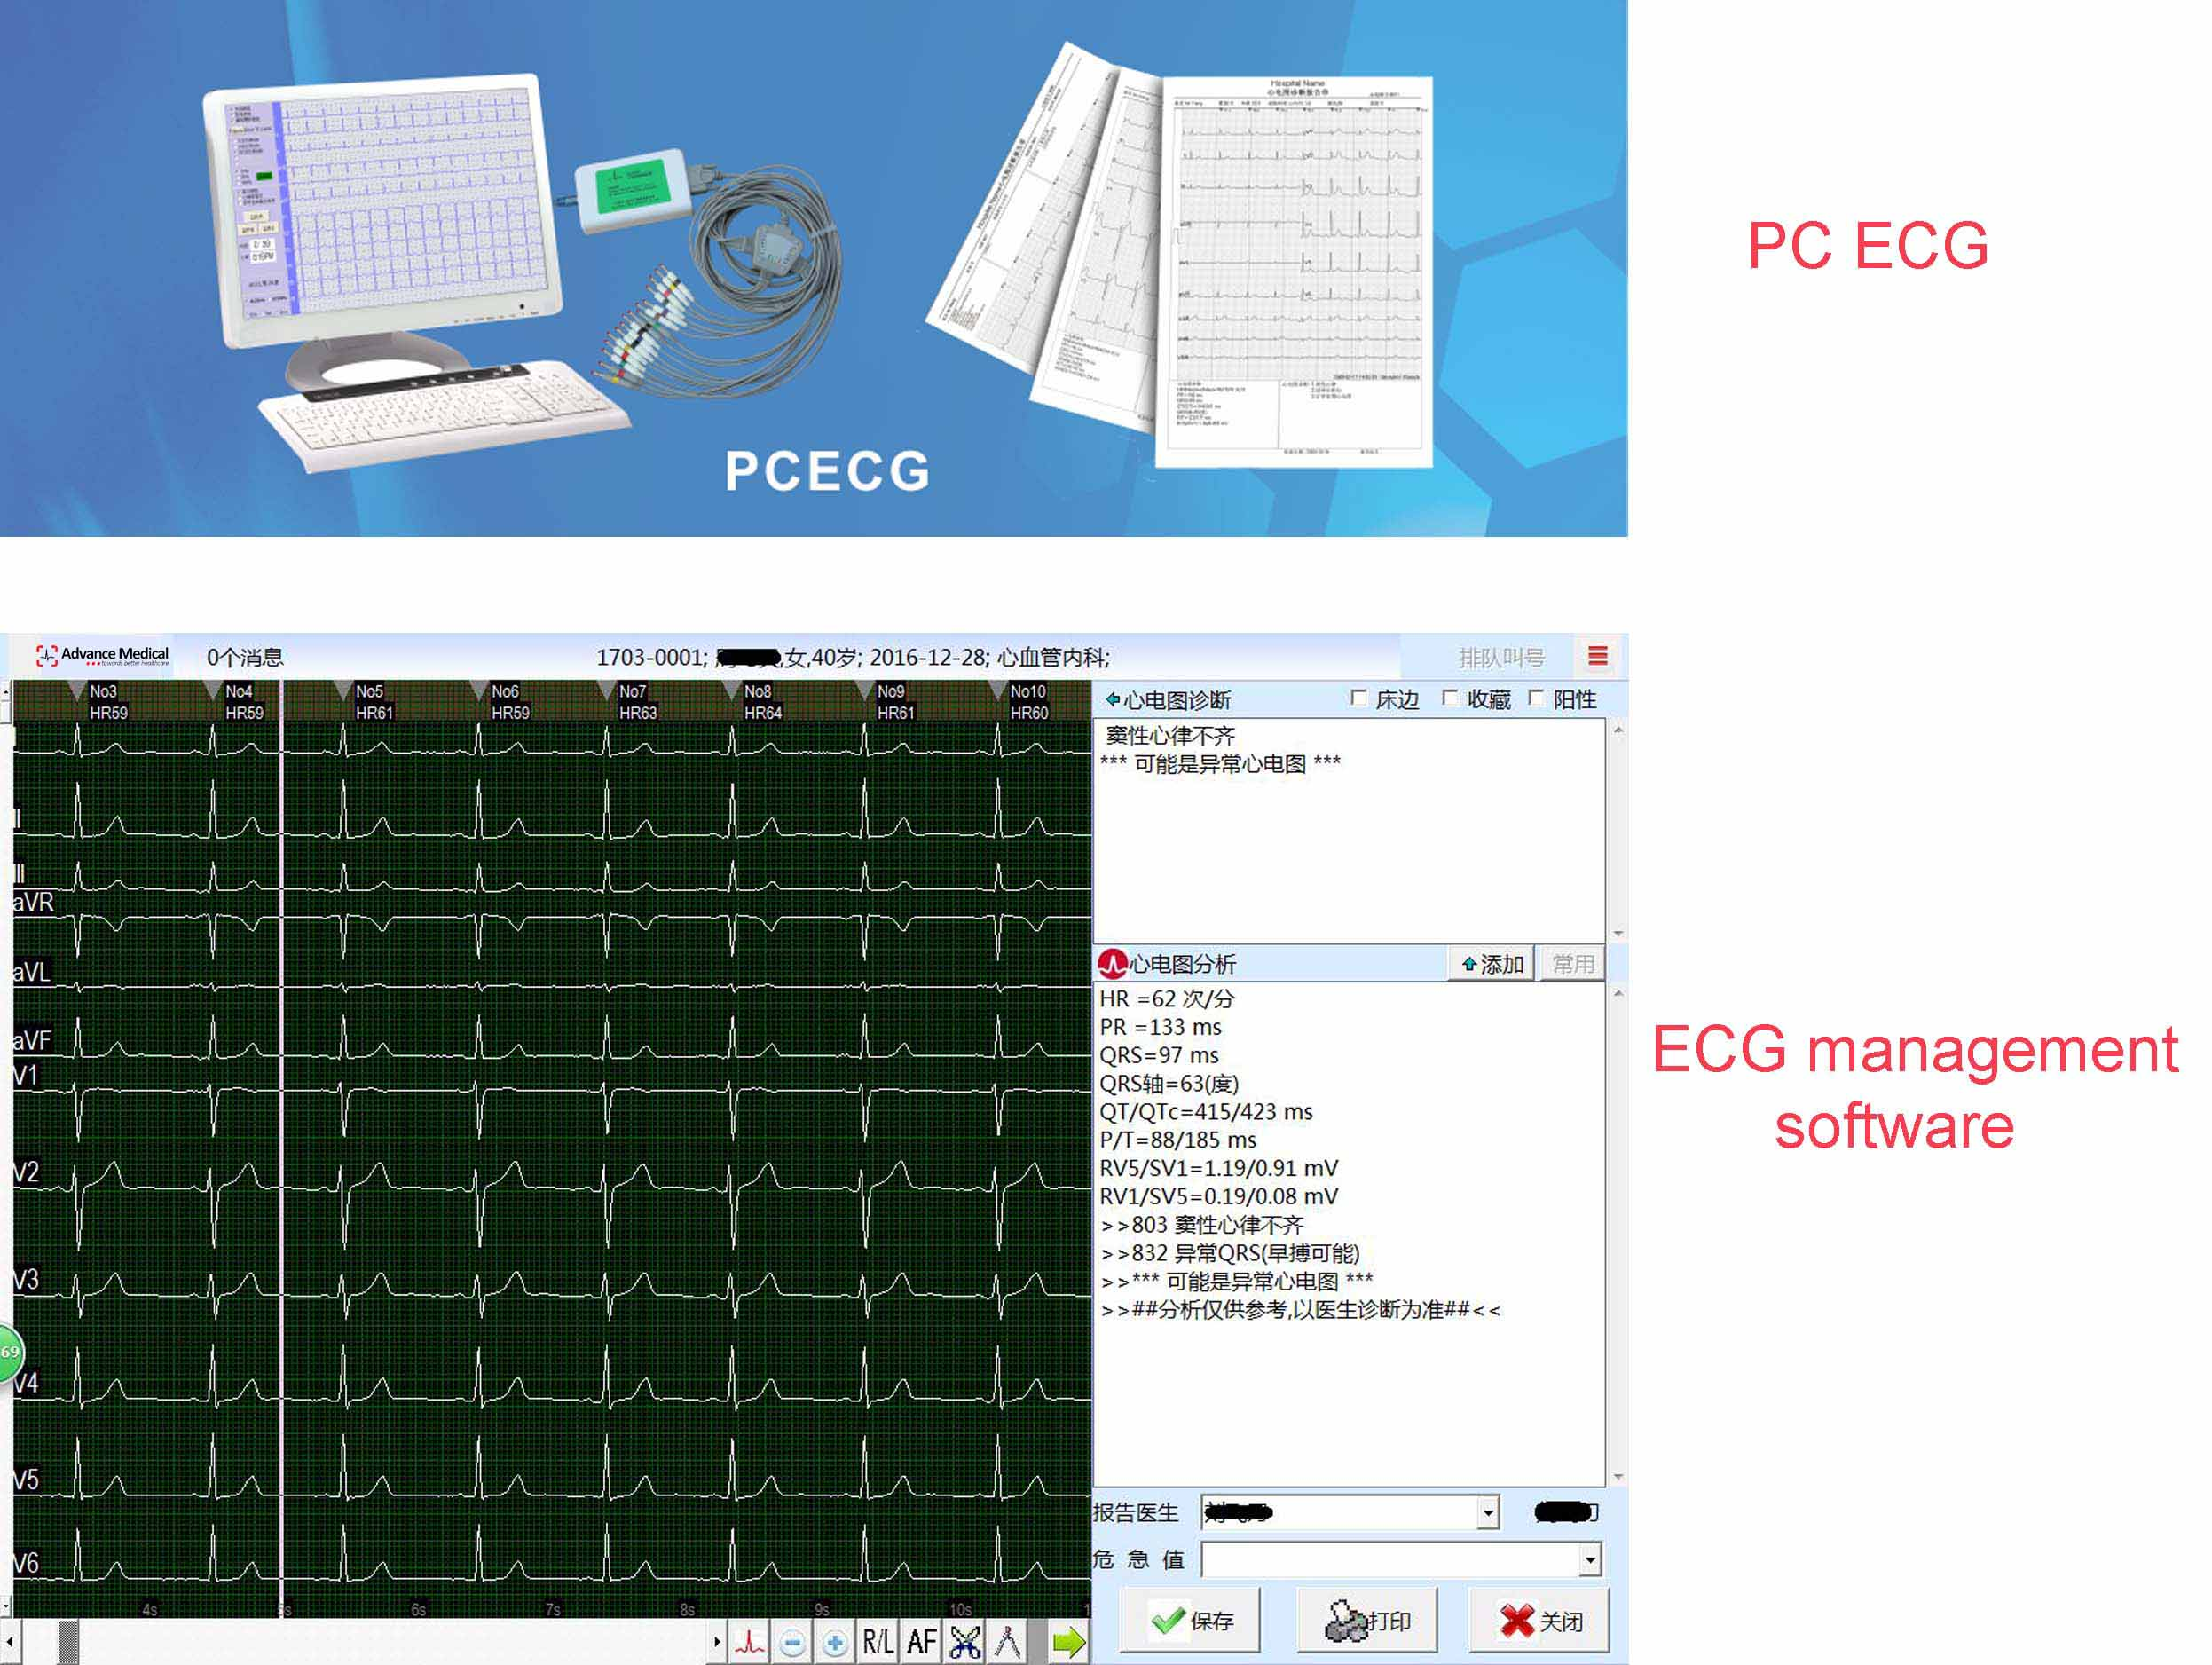 Nt-a5 Linux Pos Terminal,Windows Pos Machine,58mm Thermal